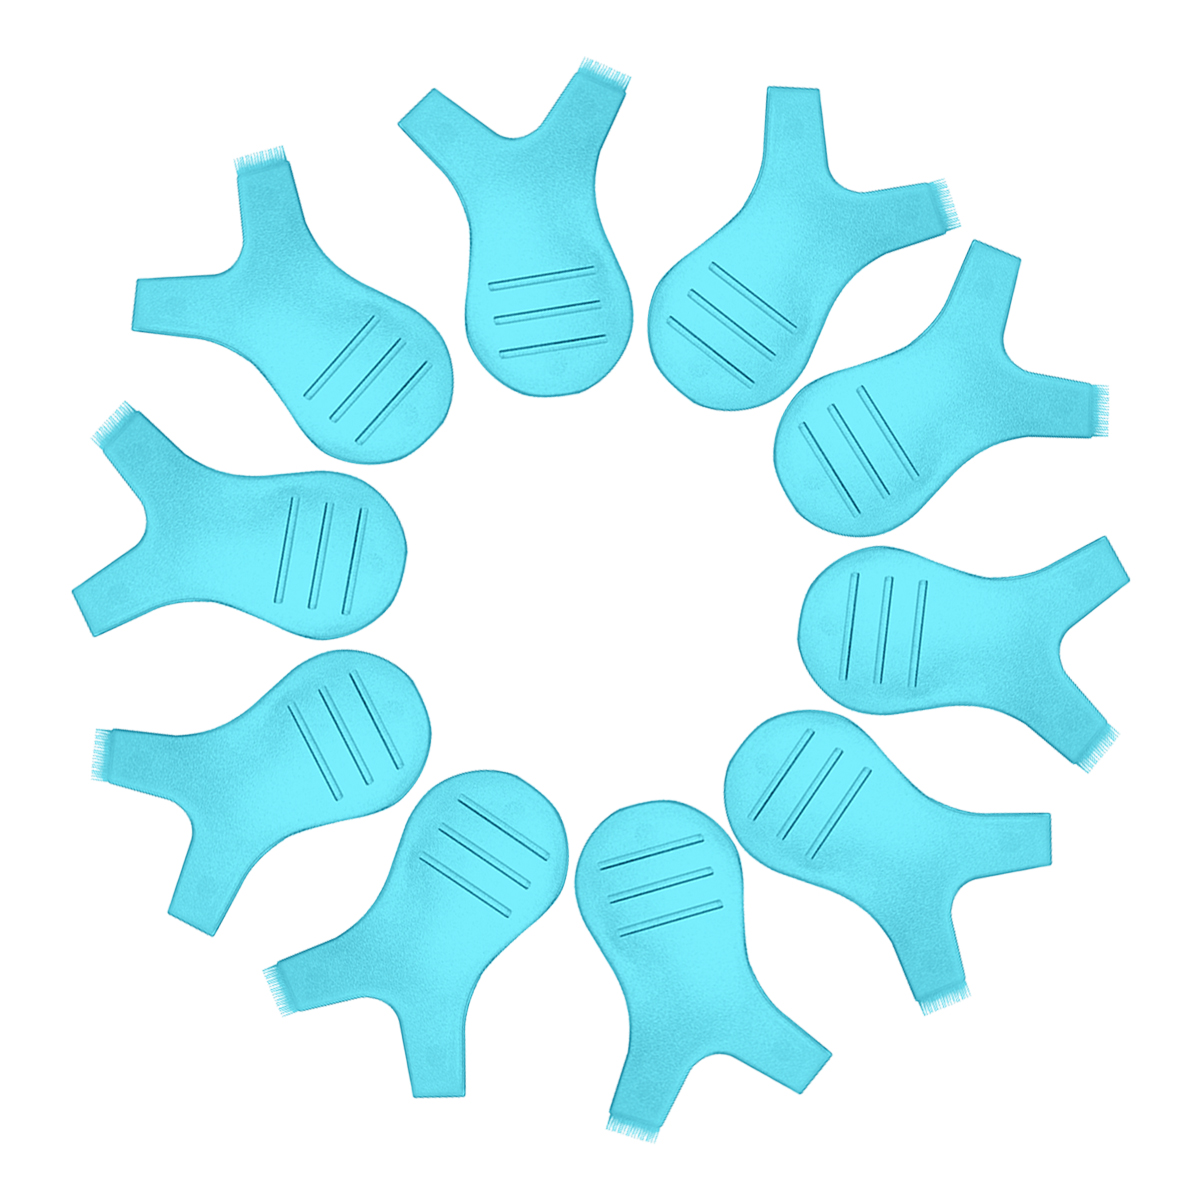 100 pieces Bag Color Blue Can Use Again Plastic Soft Brushes Mini Eye lash Brush Lashes